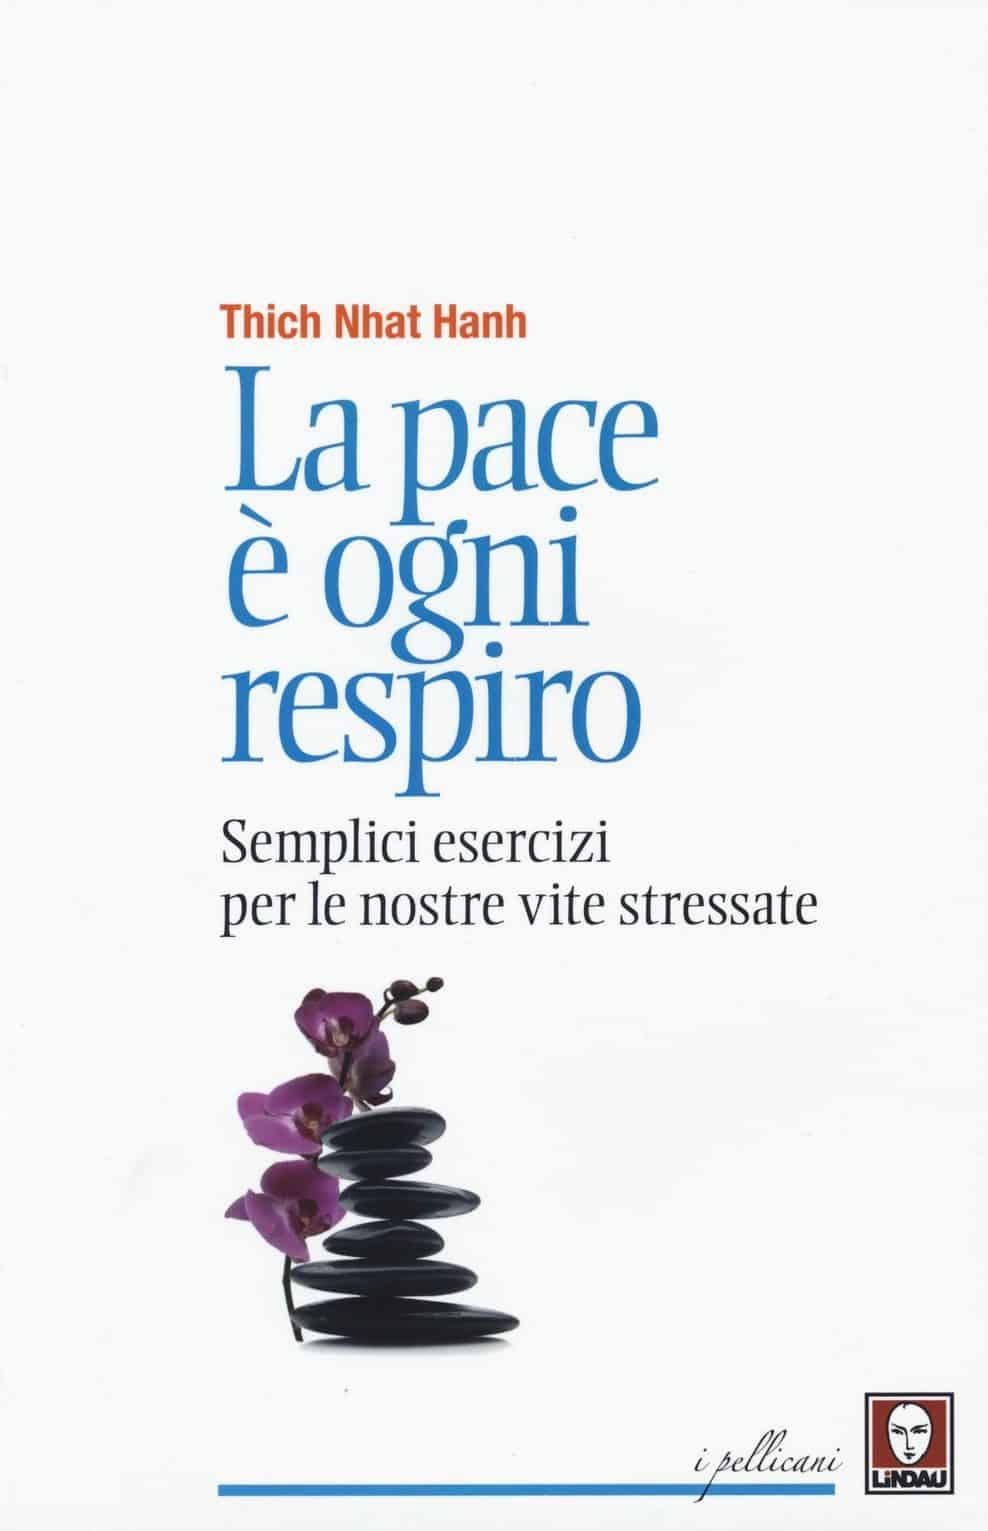 La pace è ogni respiro | Libri consigliati | Osteopata Francesco Bertino Genova